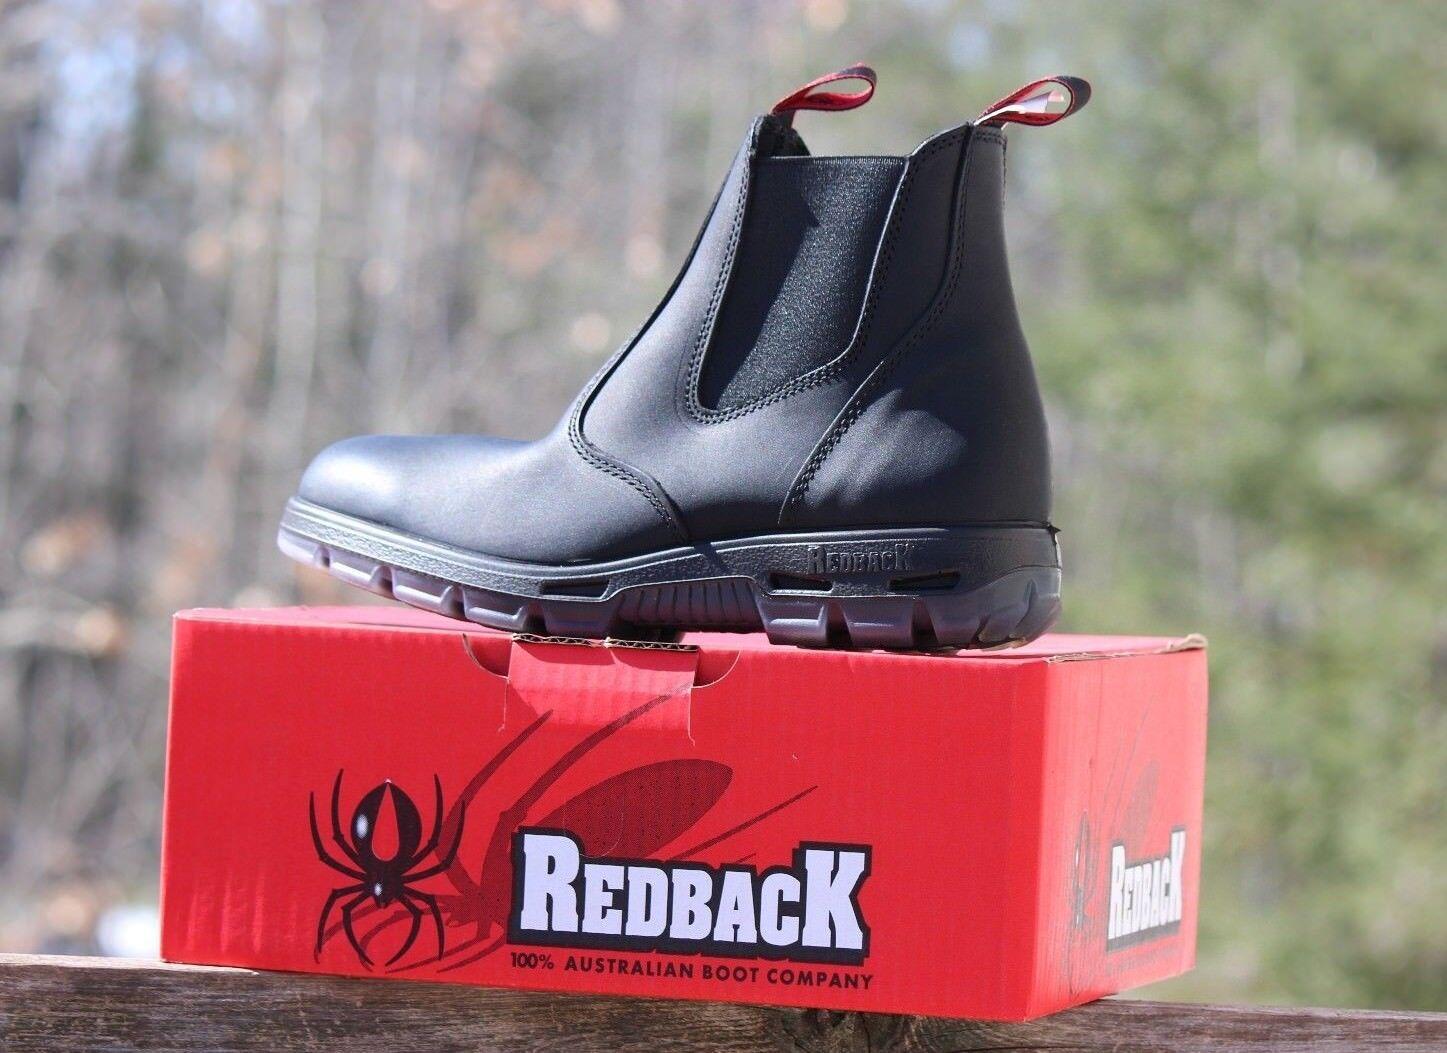 NEW Redback UBBK Men's Easy Escape Soft Toe Work Boots NIB Genuin Black Leather